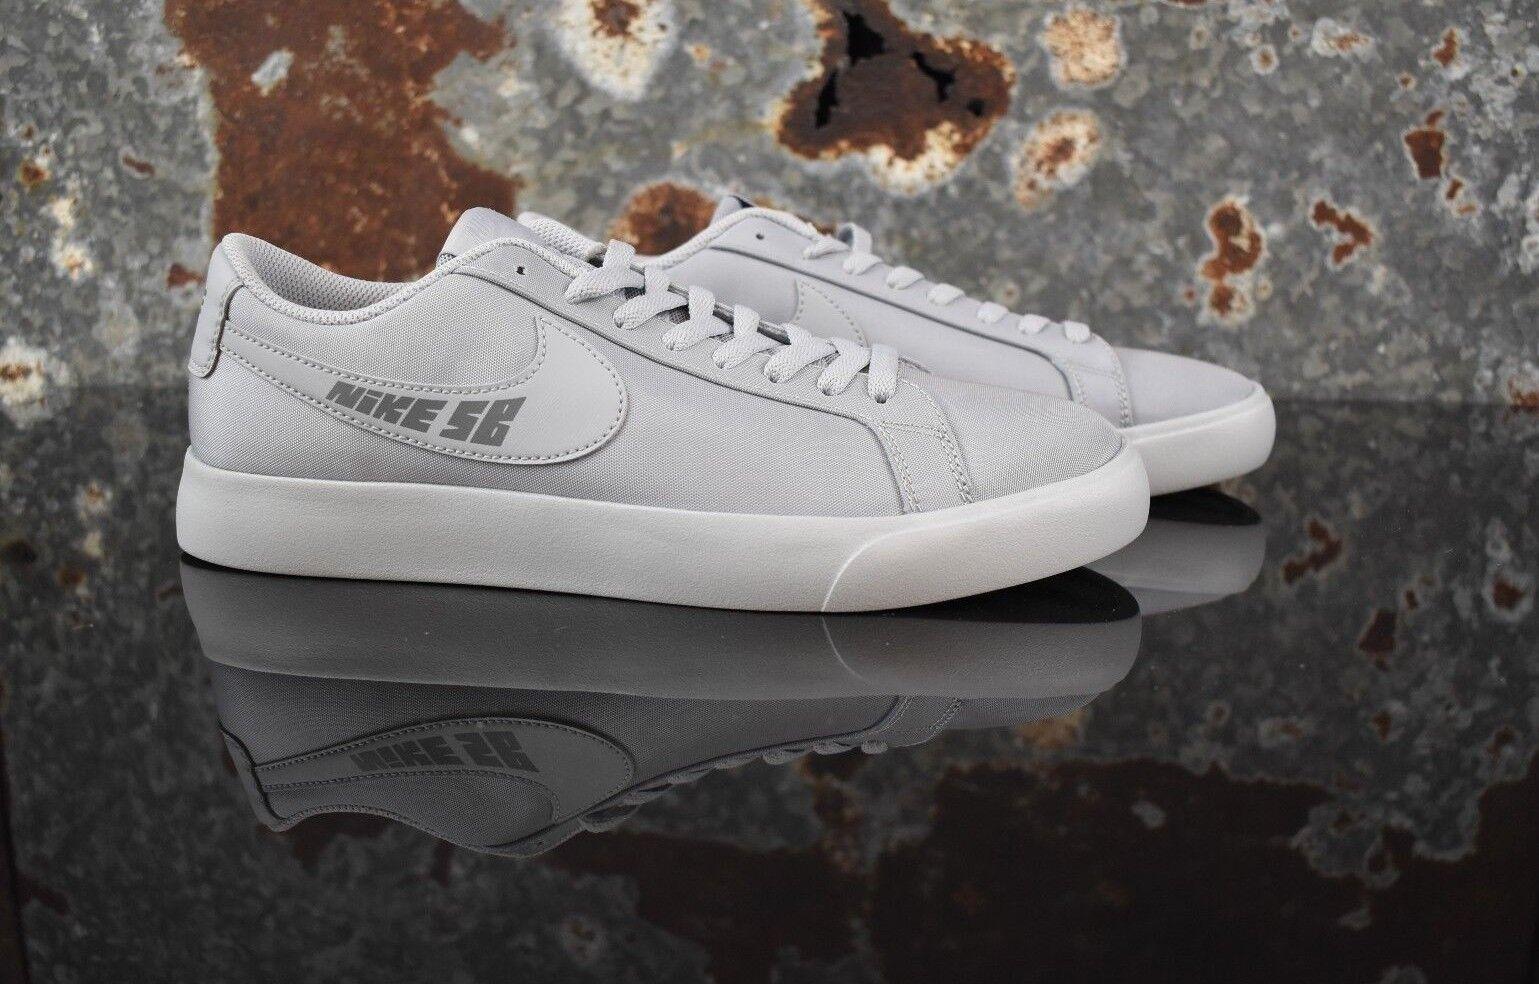 New Men's Nike SB Blazer Vapor TXT Size 8.5 Wolf Grey Skateboarding Shoes